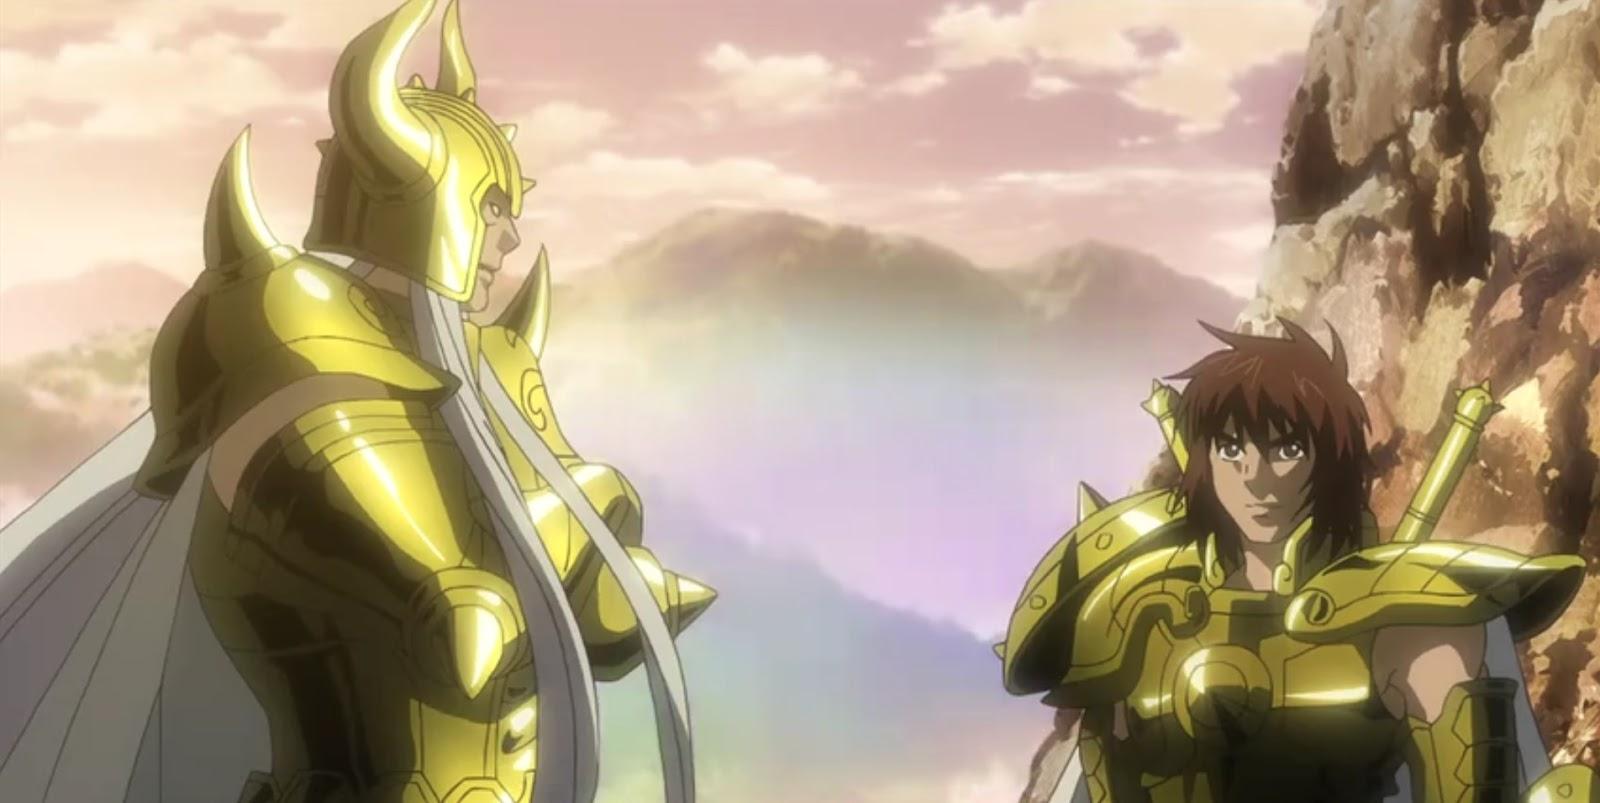 Saint Seiya: The Lost Canvas Episodio 09 Dublado